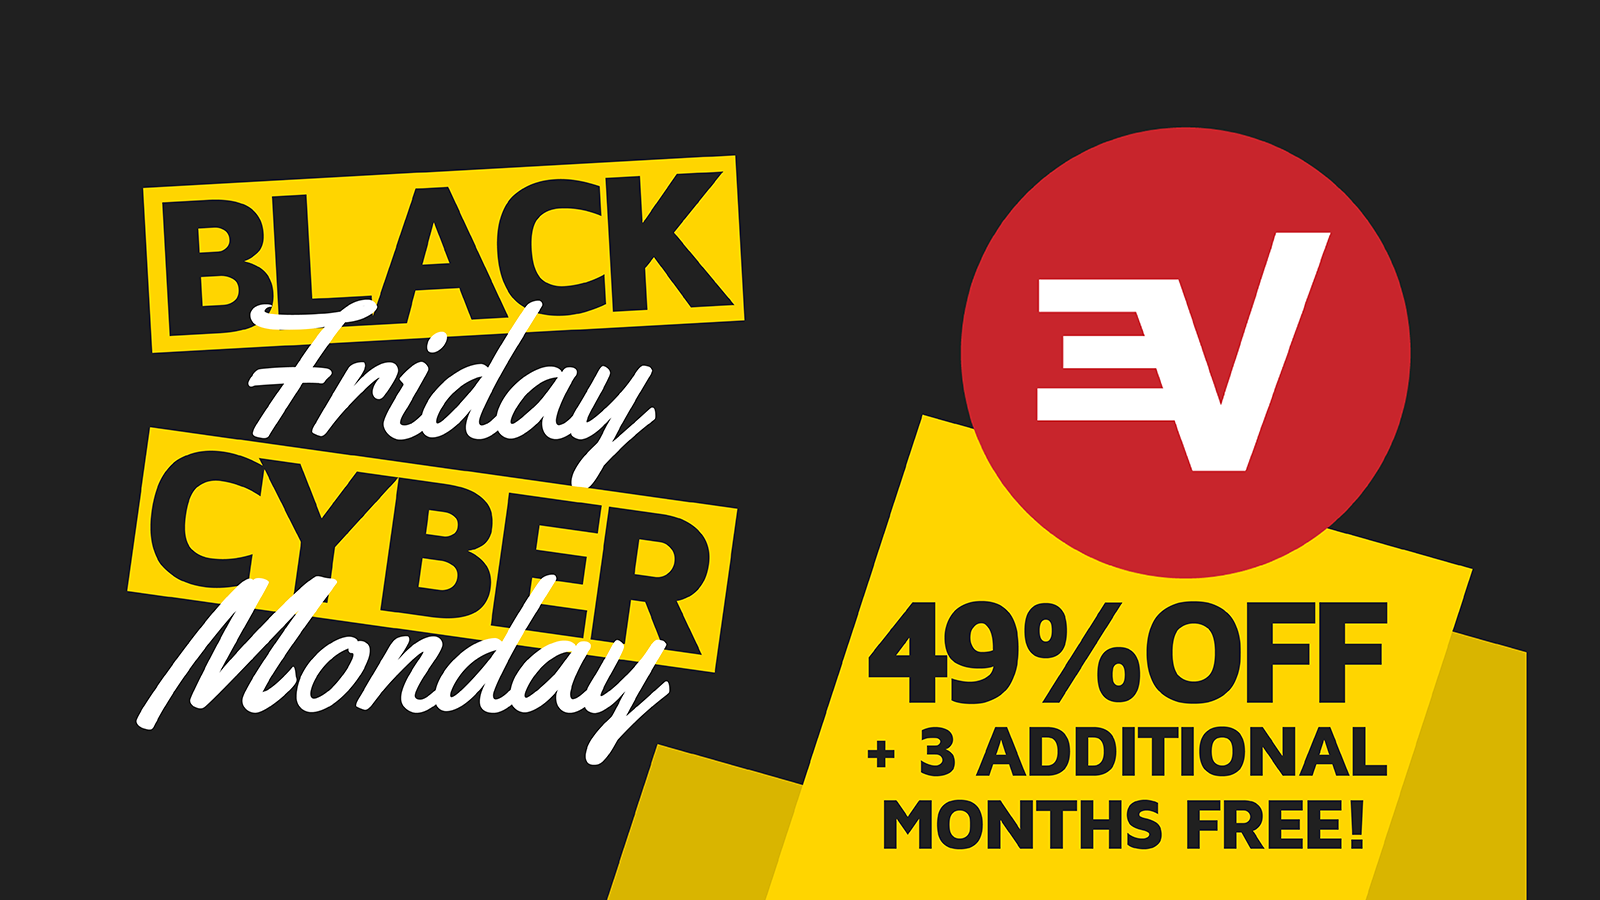 Expressvpn Black Friday 2019 Deal Save 49 And Get 3 Months Free